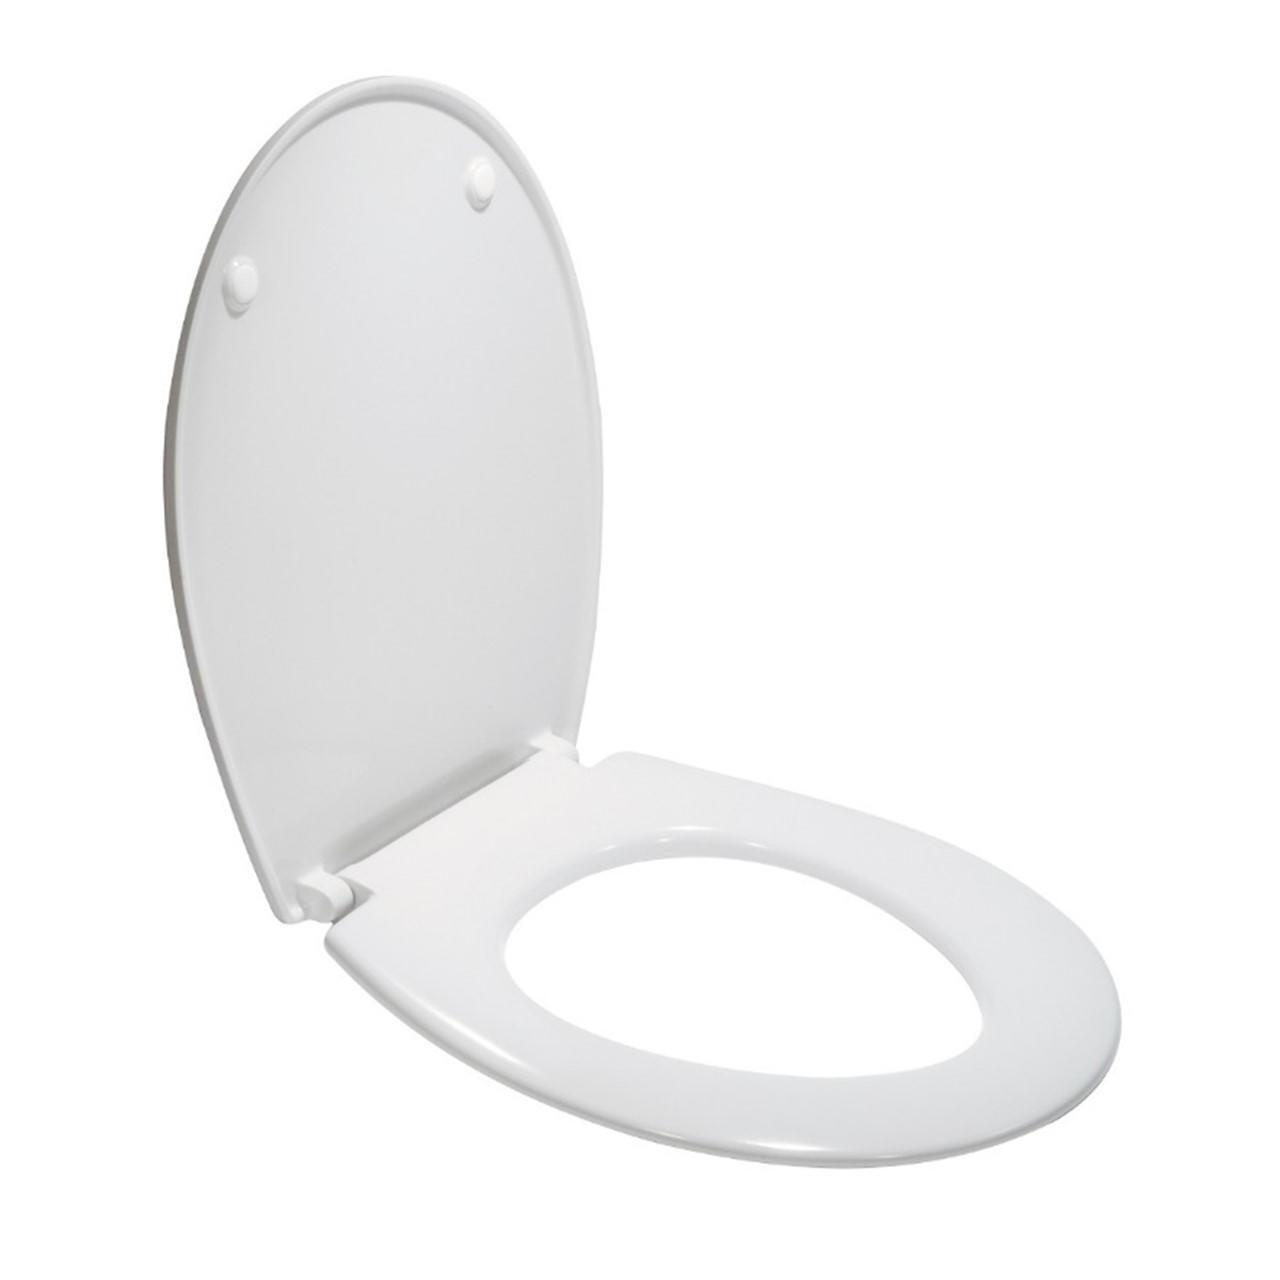 Coppia sanitari pavimento distanziato Miky New IDEAL STANDARD - 7